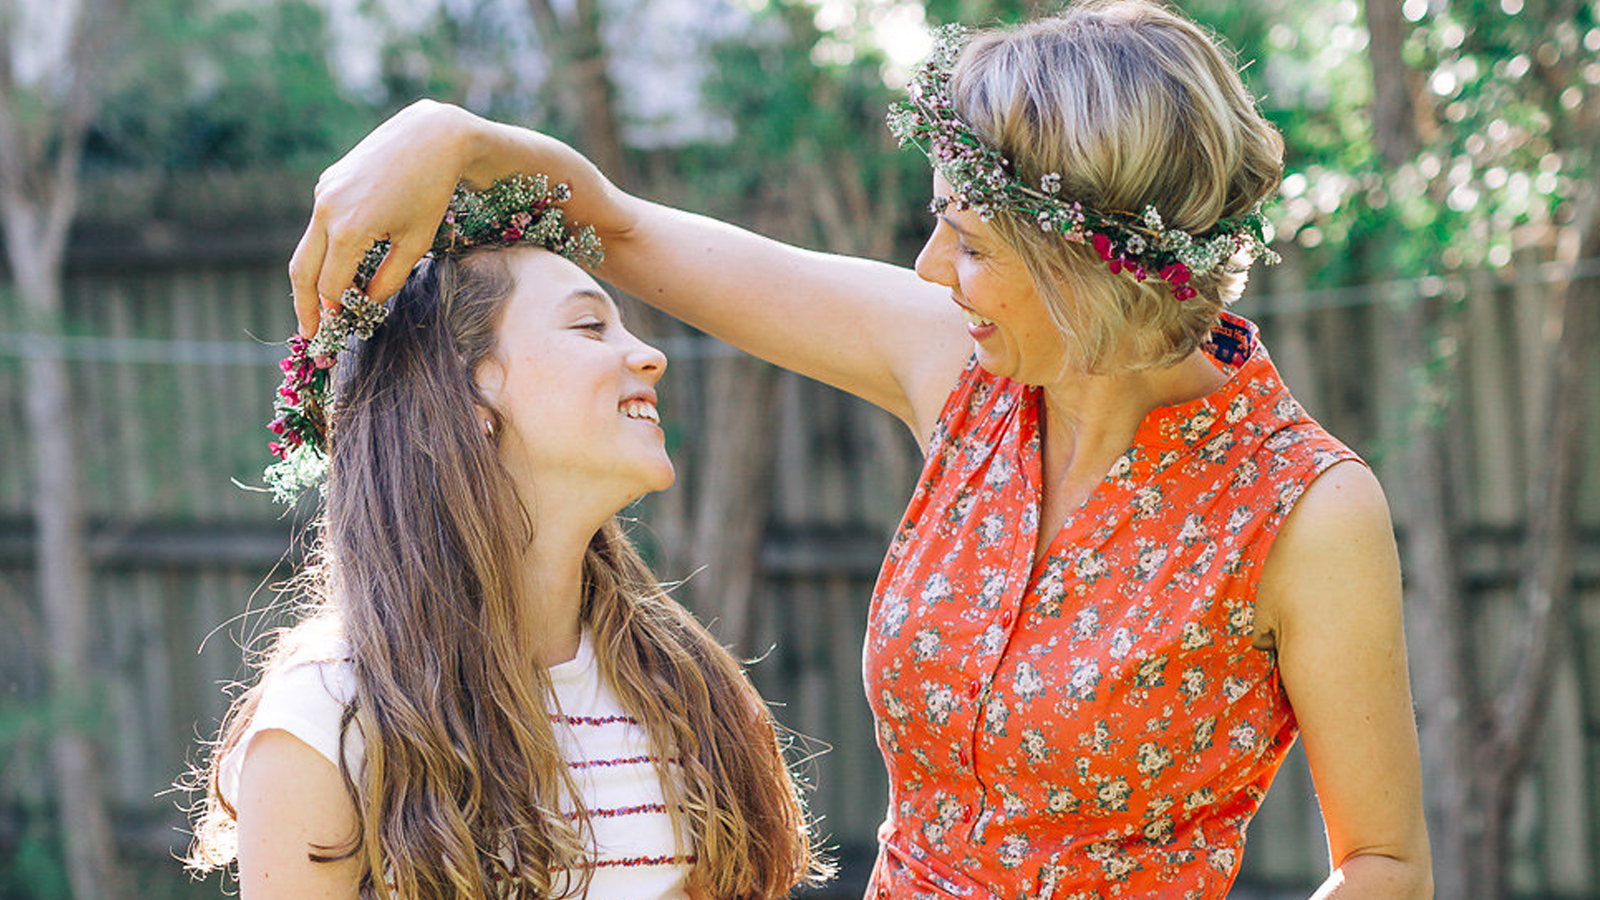 DIY Tinker Bell Flower Crown